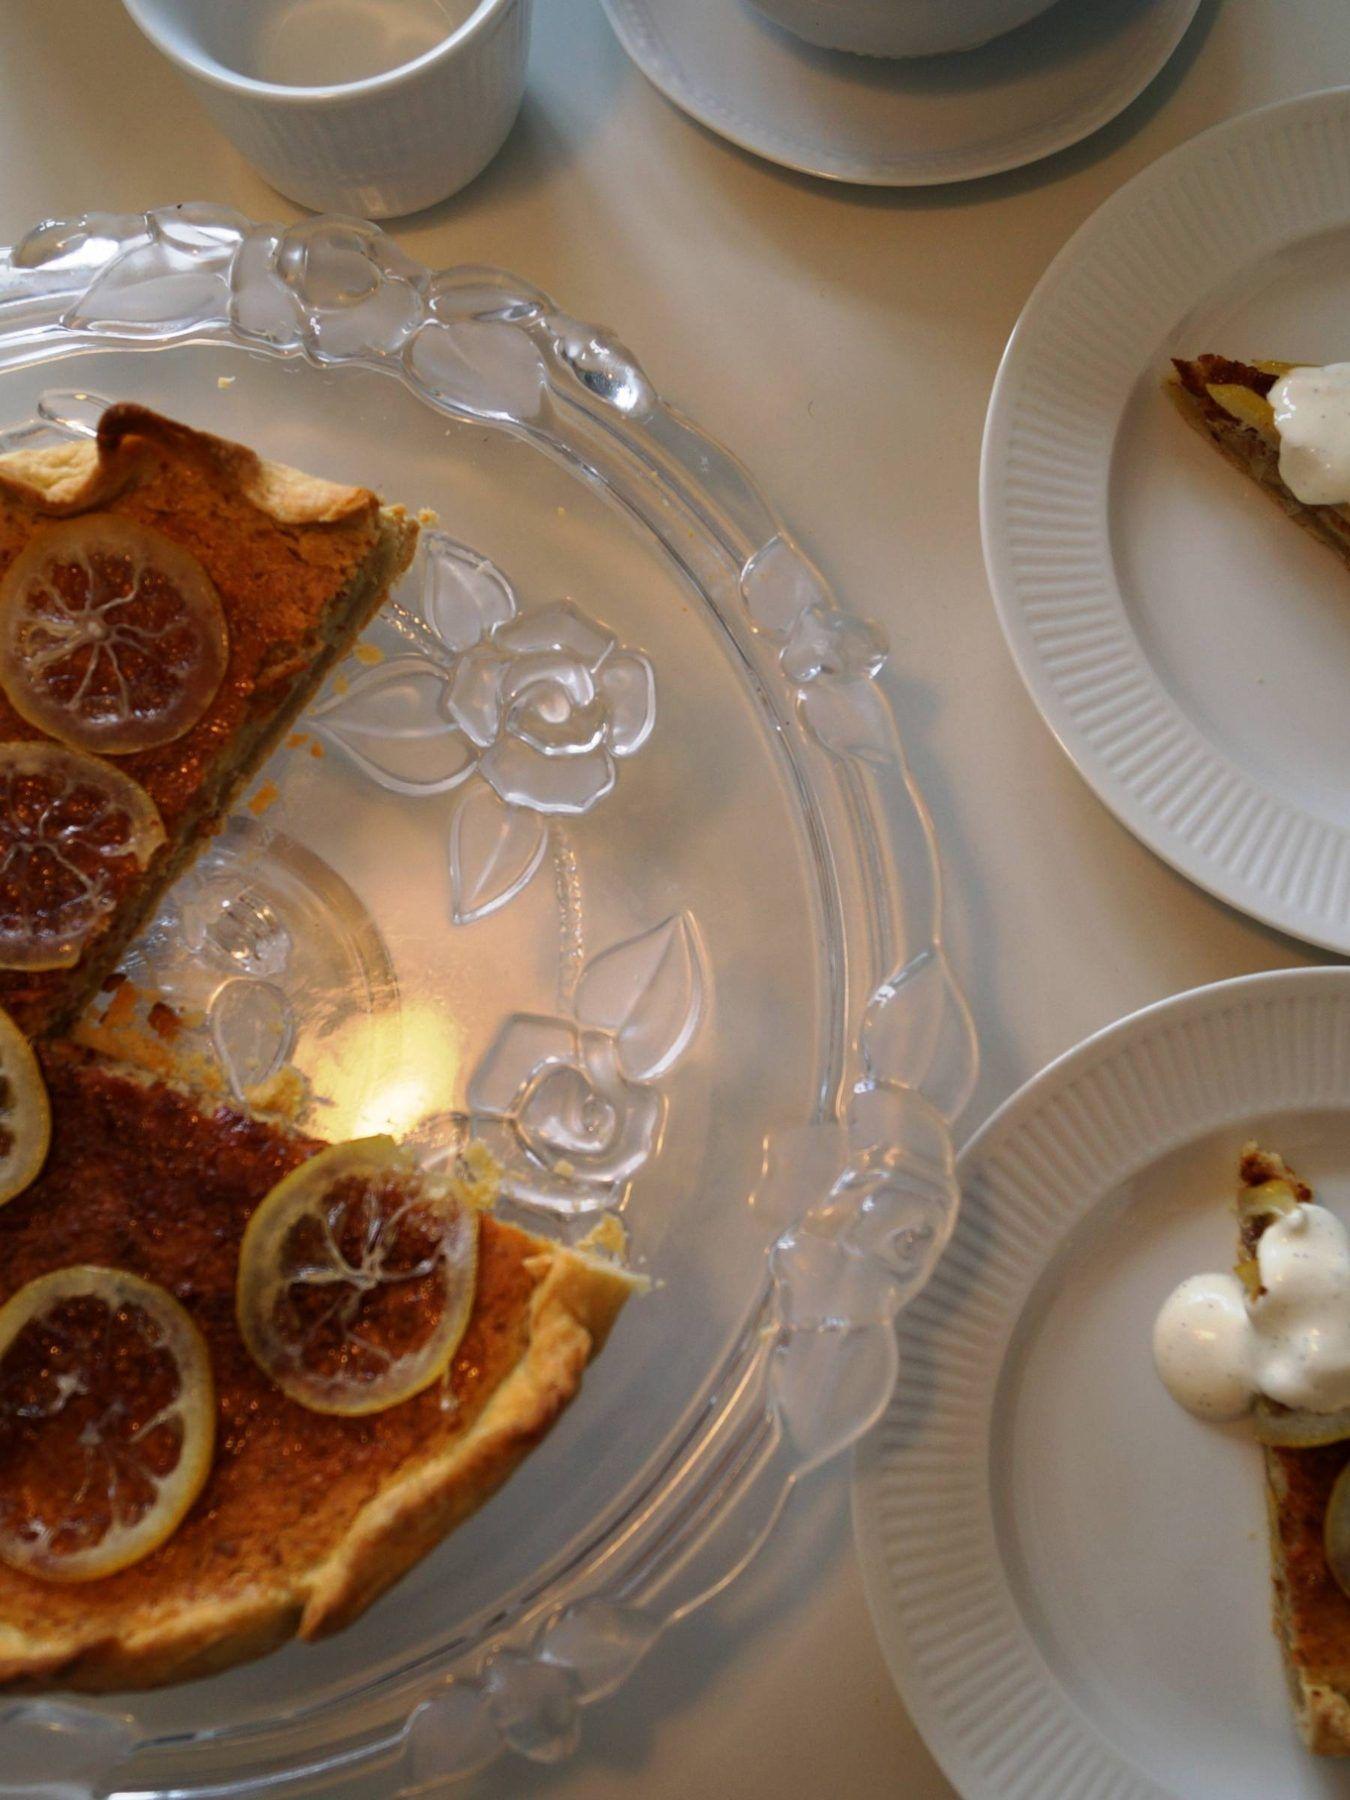 Citrontærte med vaniljecremefraiche